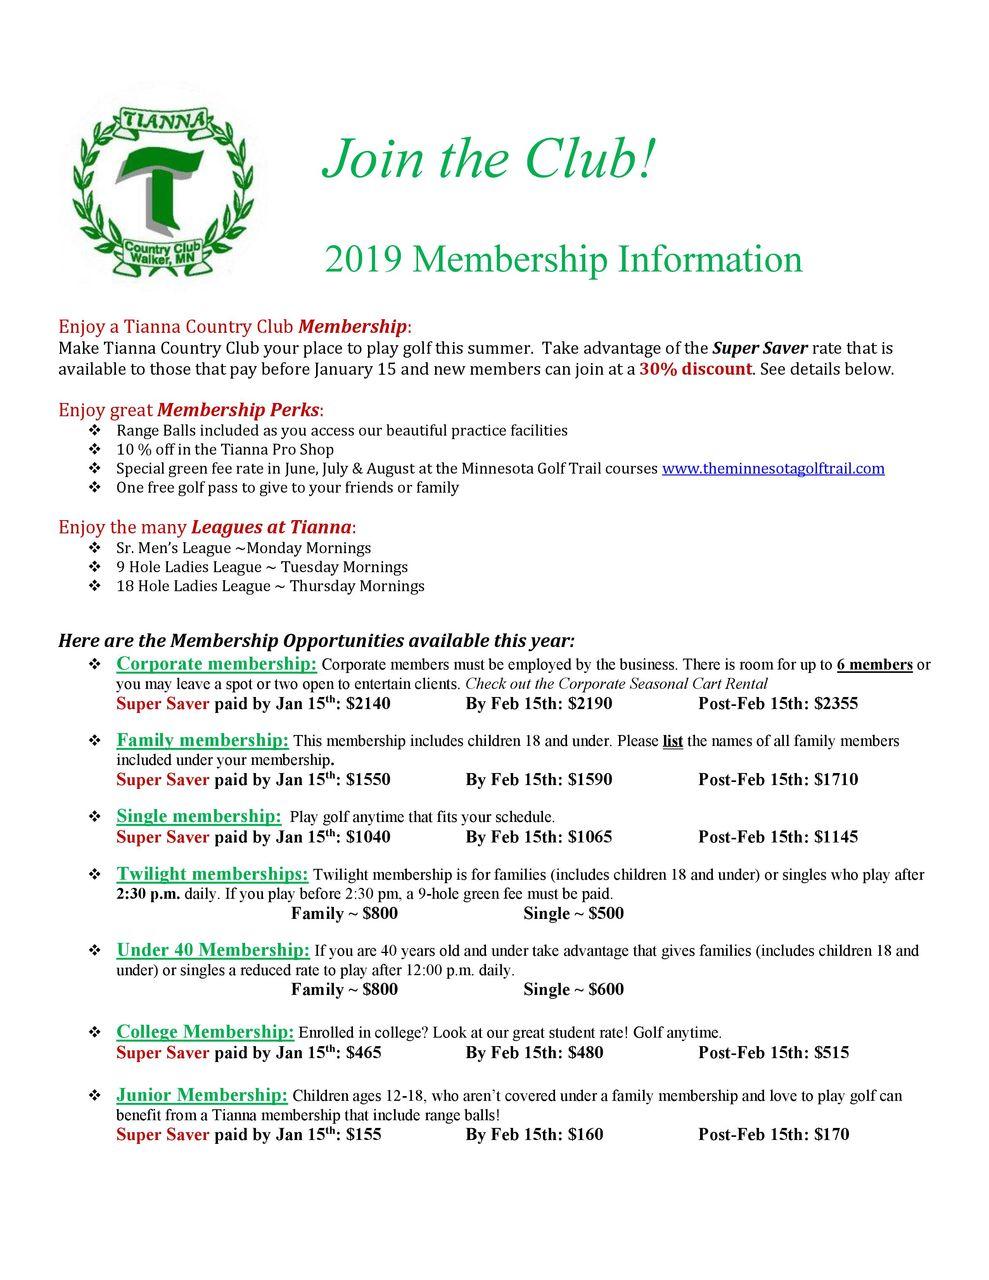 Membership - Tianna Country Club